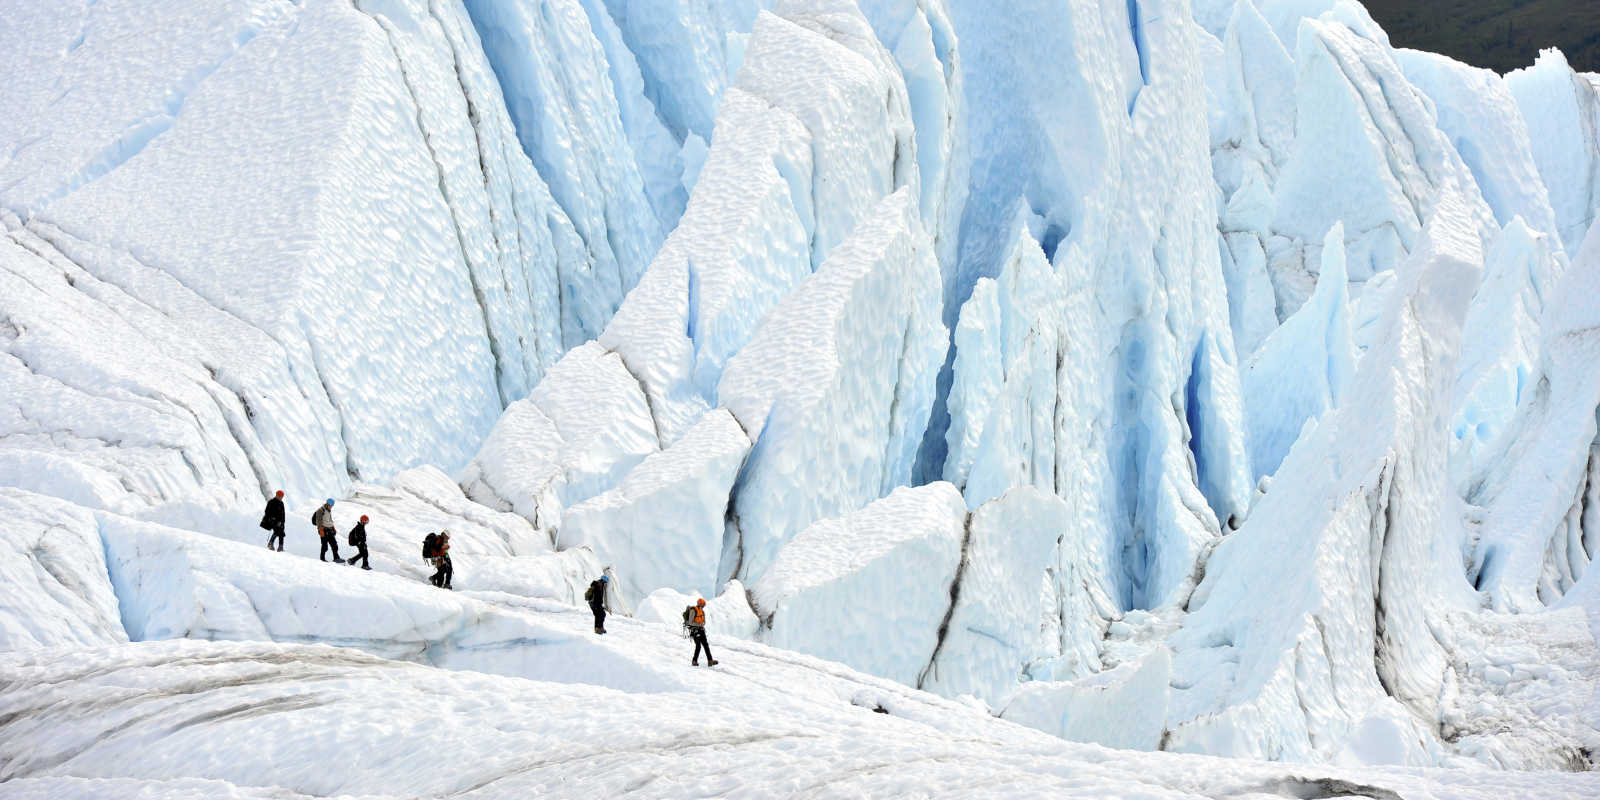 Matanuska glacier trekking